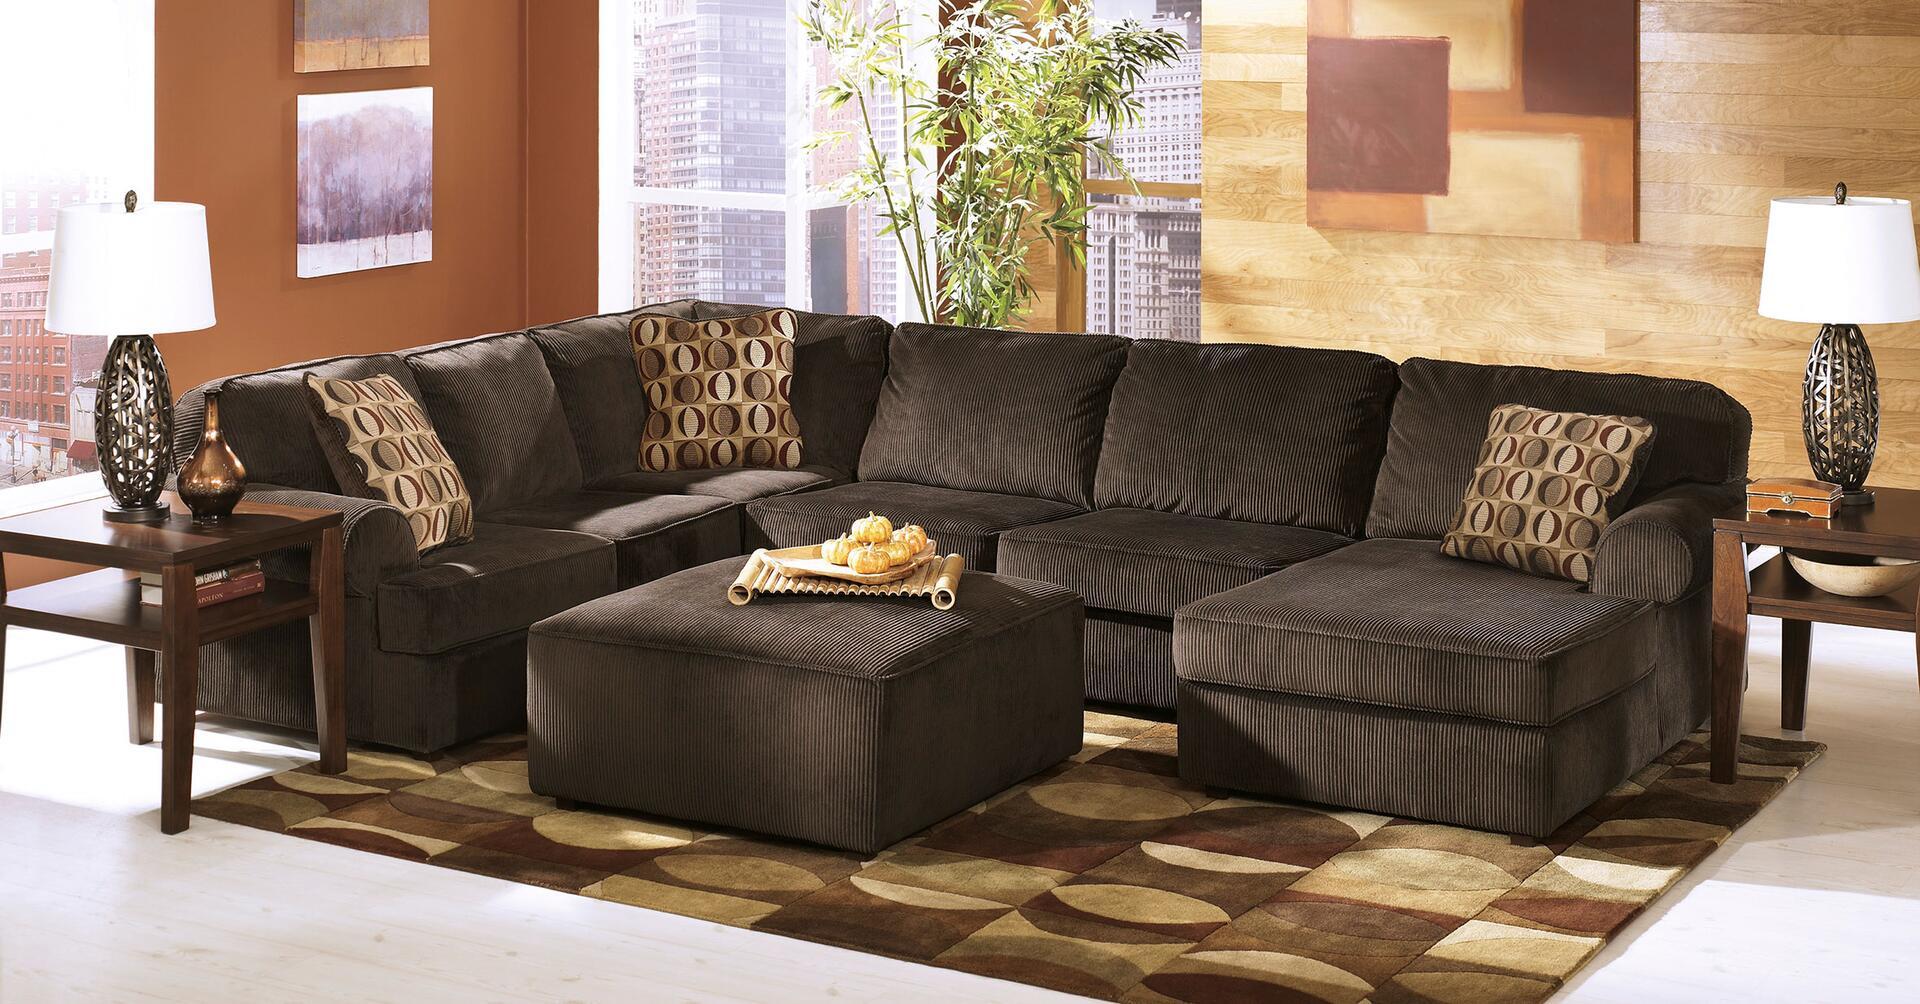 Ashley Vista Series Stationary Fabric Sofa